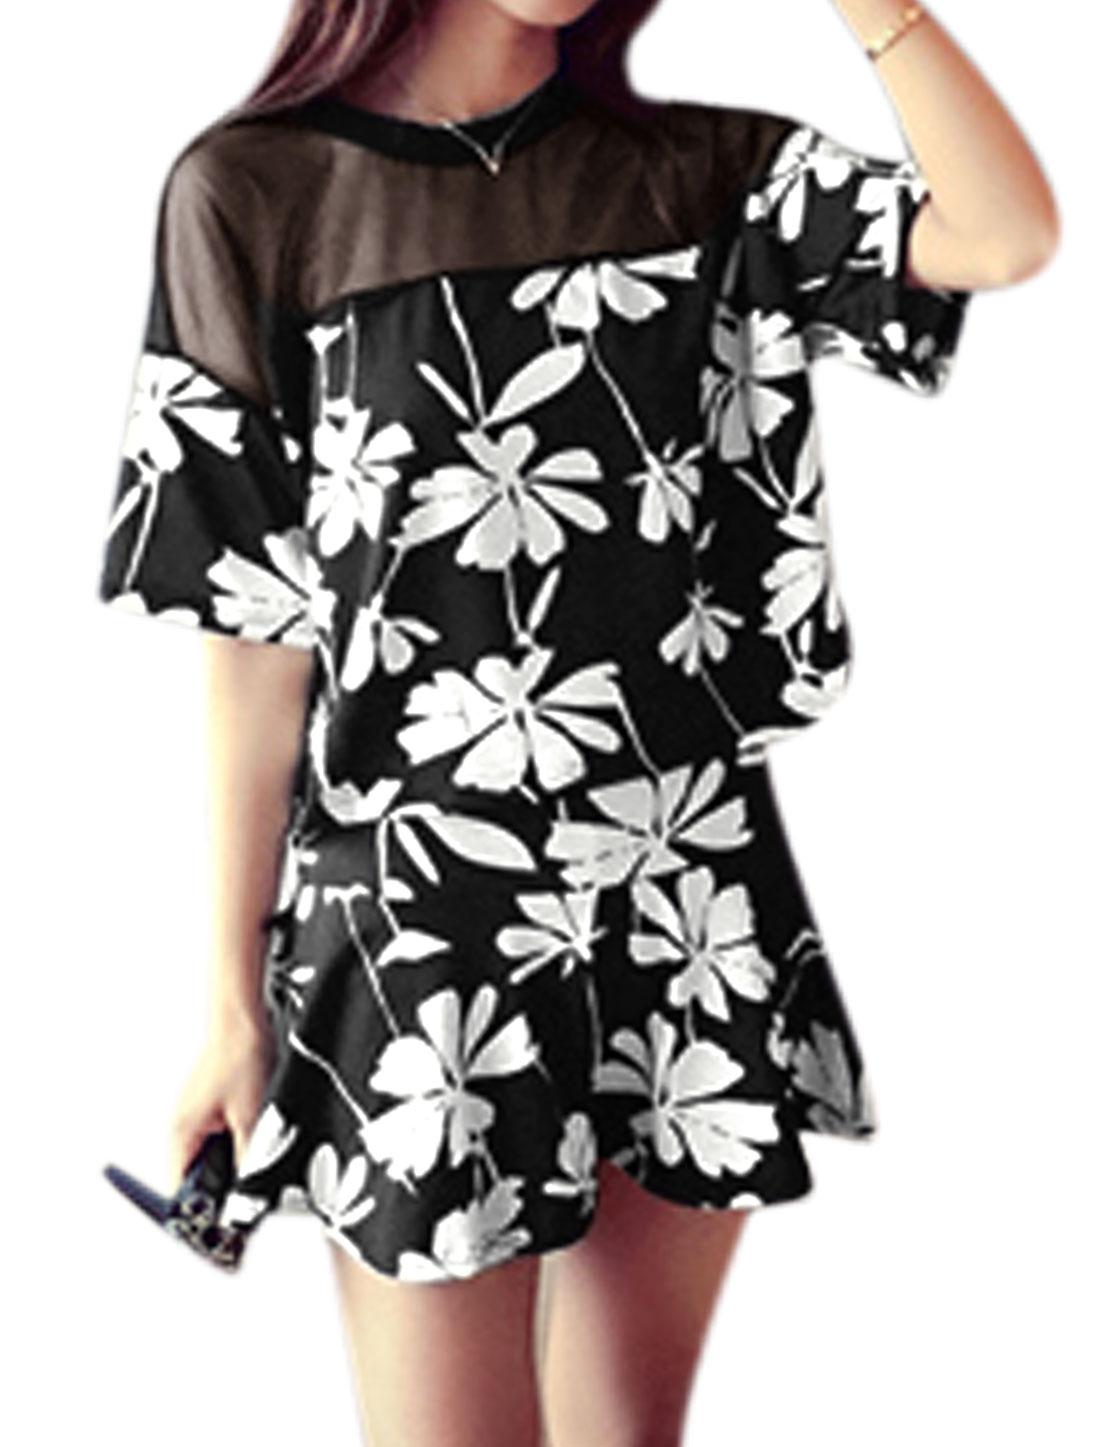 Woman Mesh Panel Floral Prints Top w Elastic Waist Skirt Set Black XS